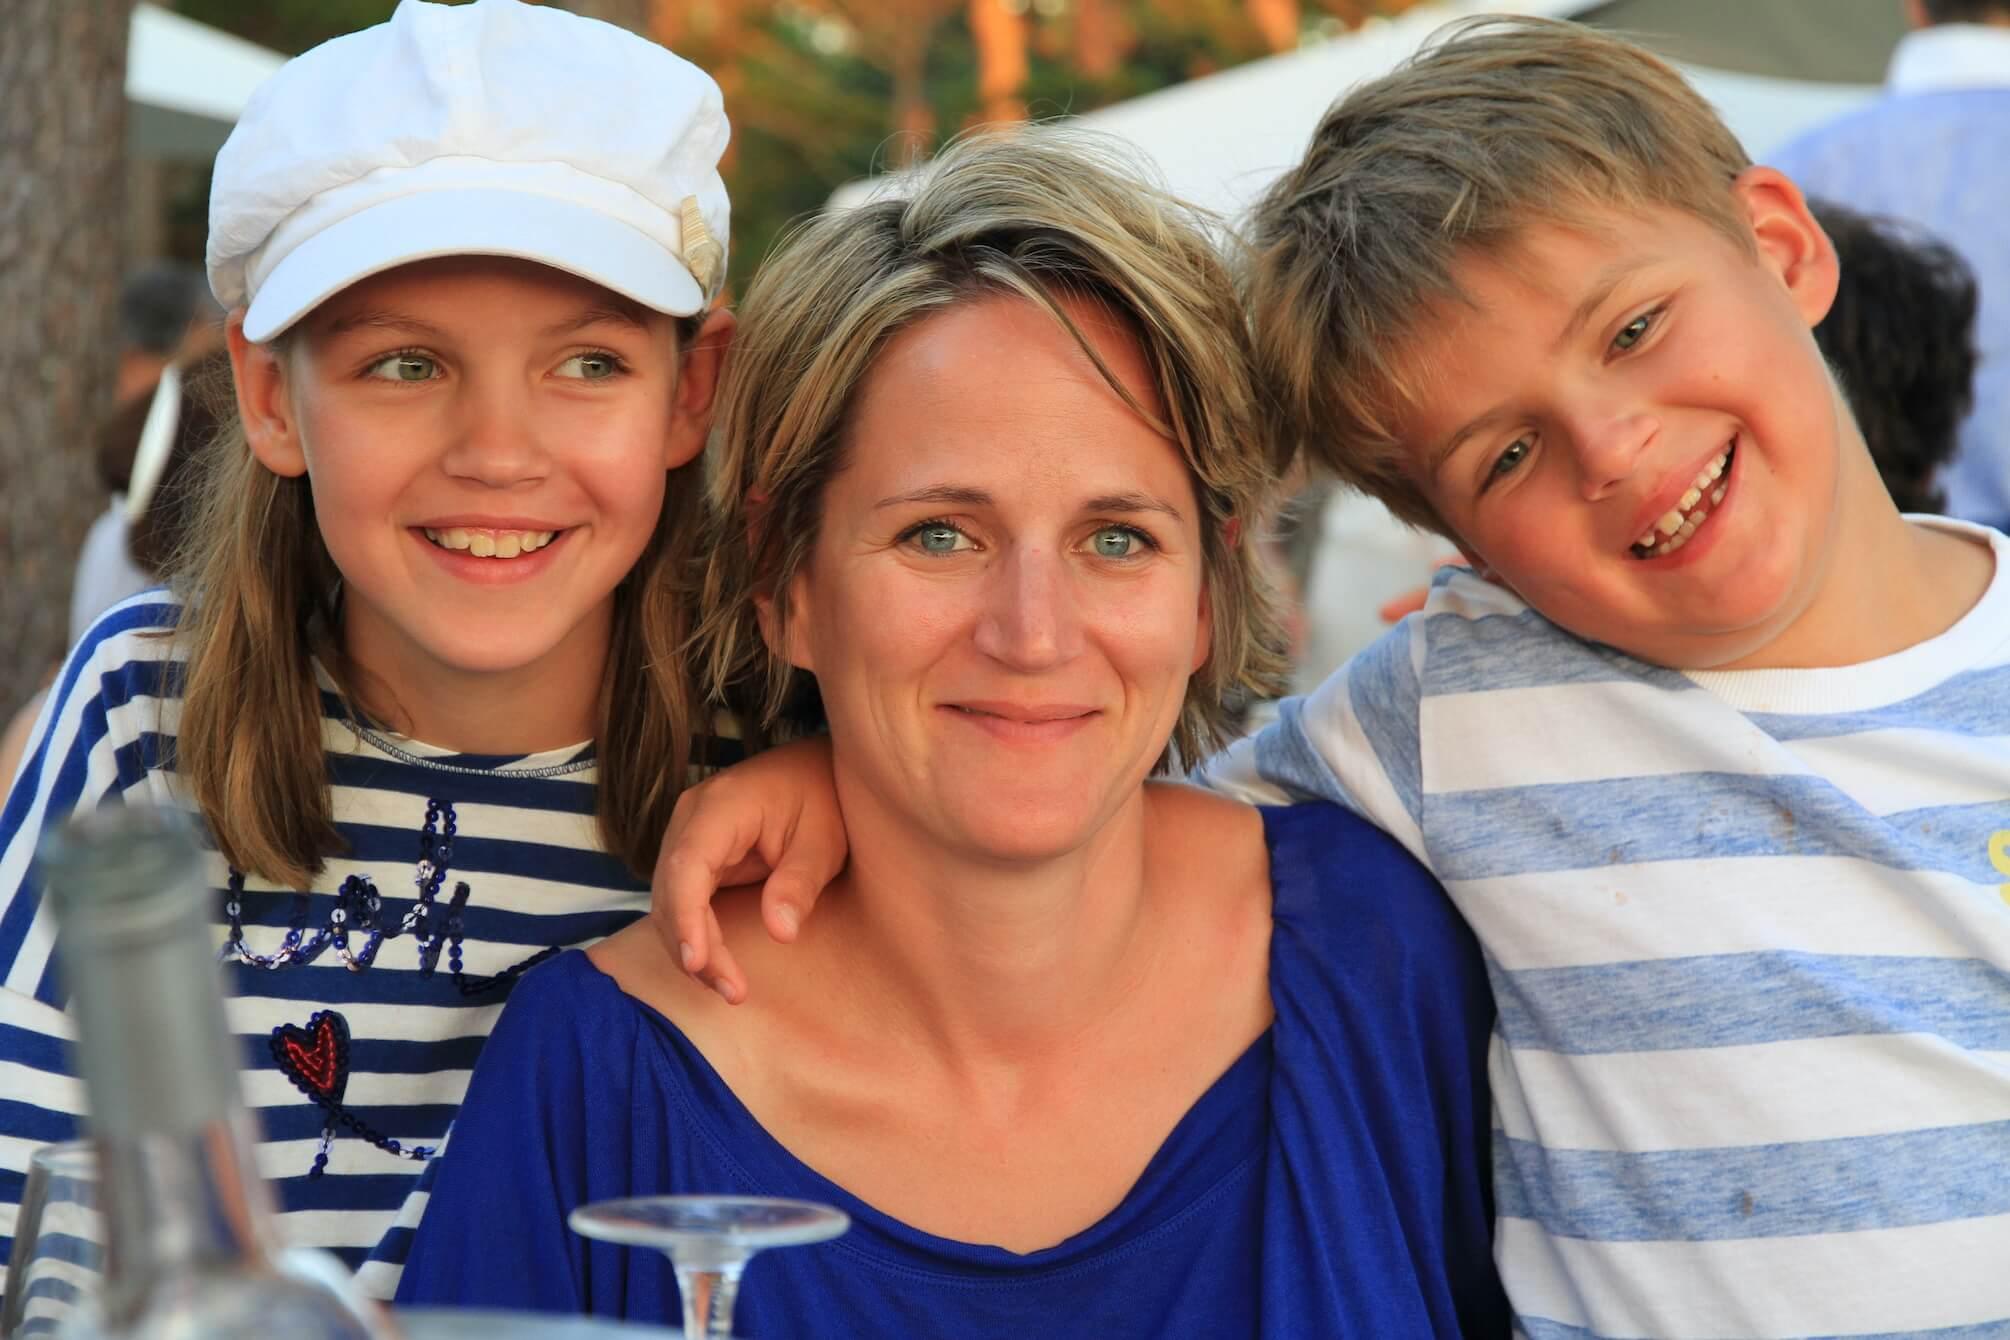 Expatmamas-Wissen: E- Elterngeld & Co - www.expatmamas.de/blog/ #expatmamas #imauslandzuhause